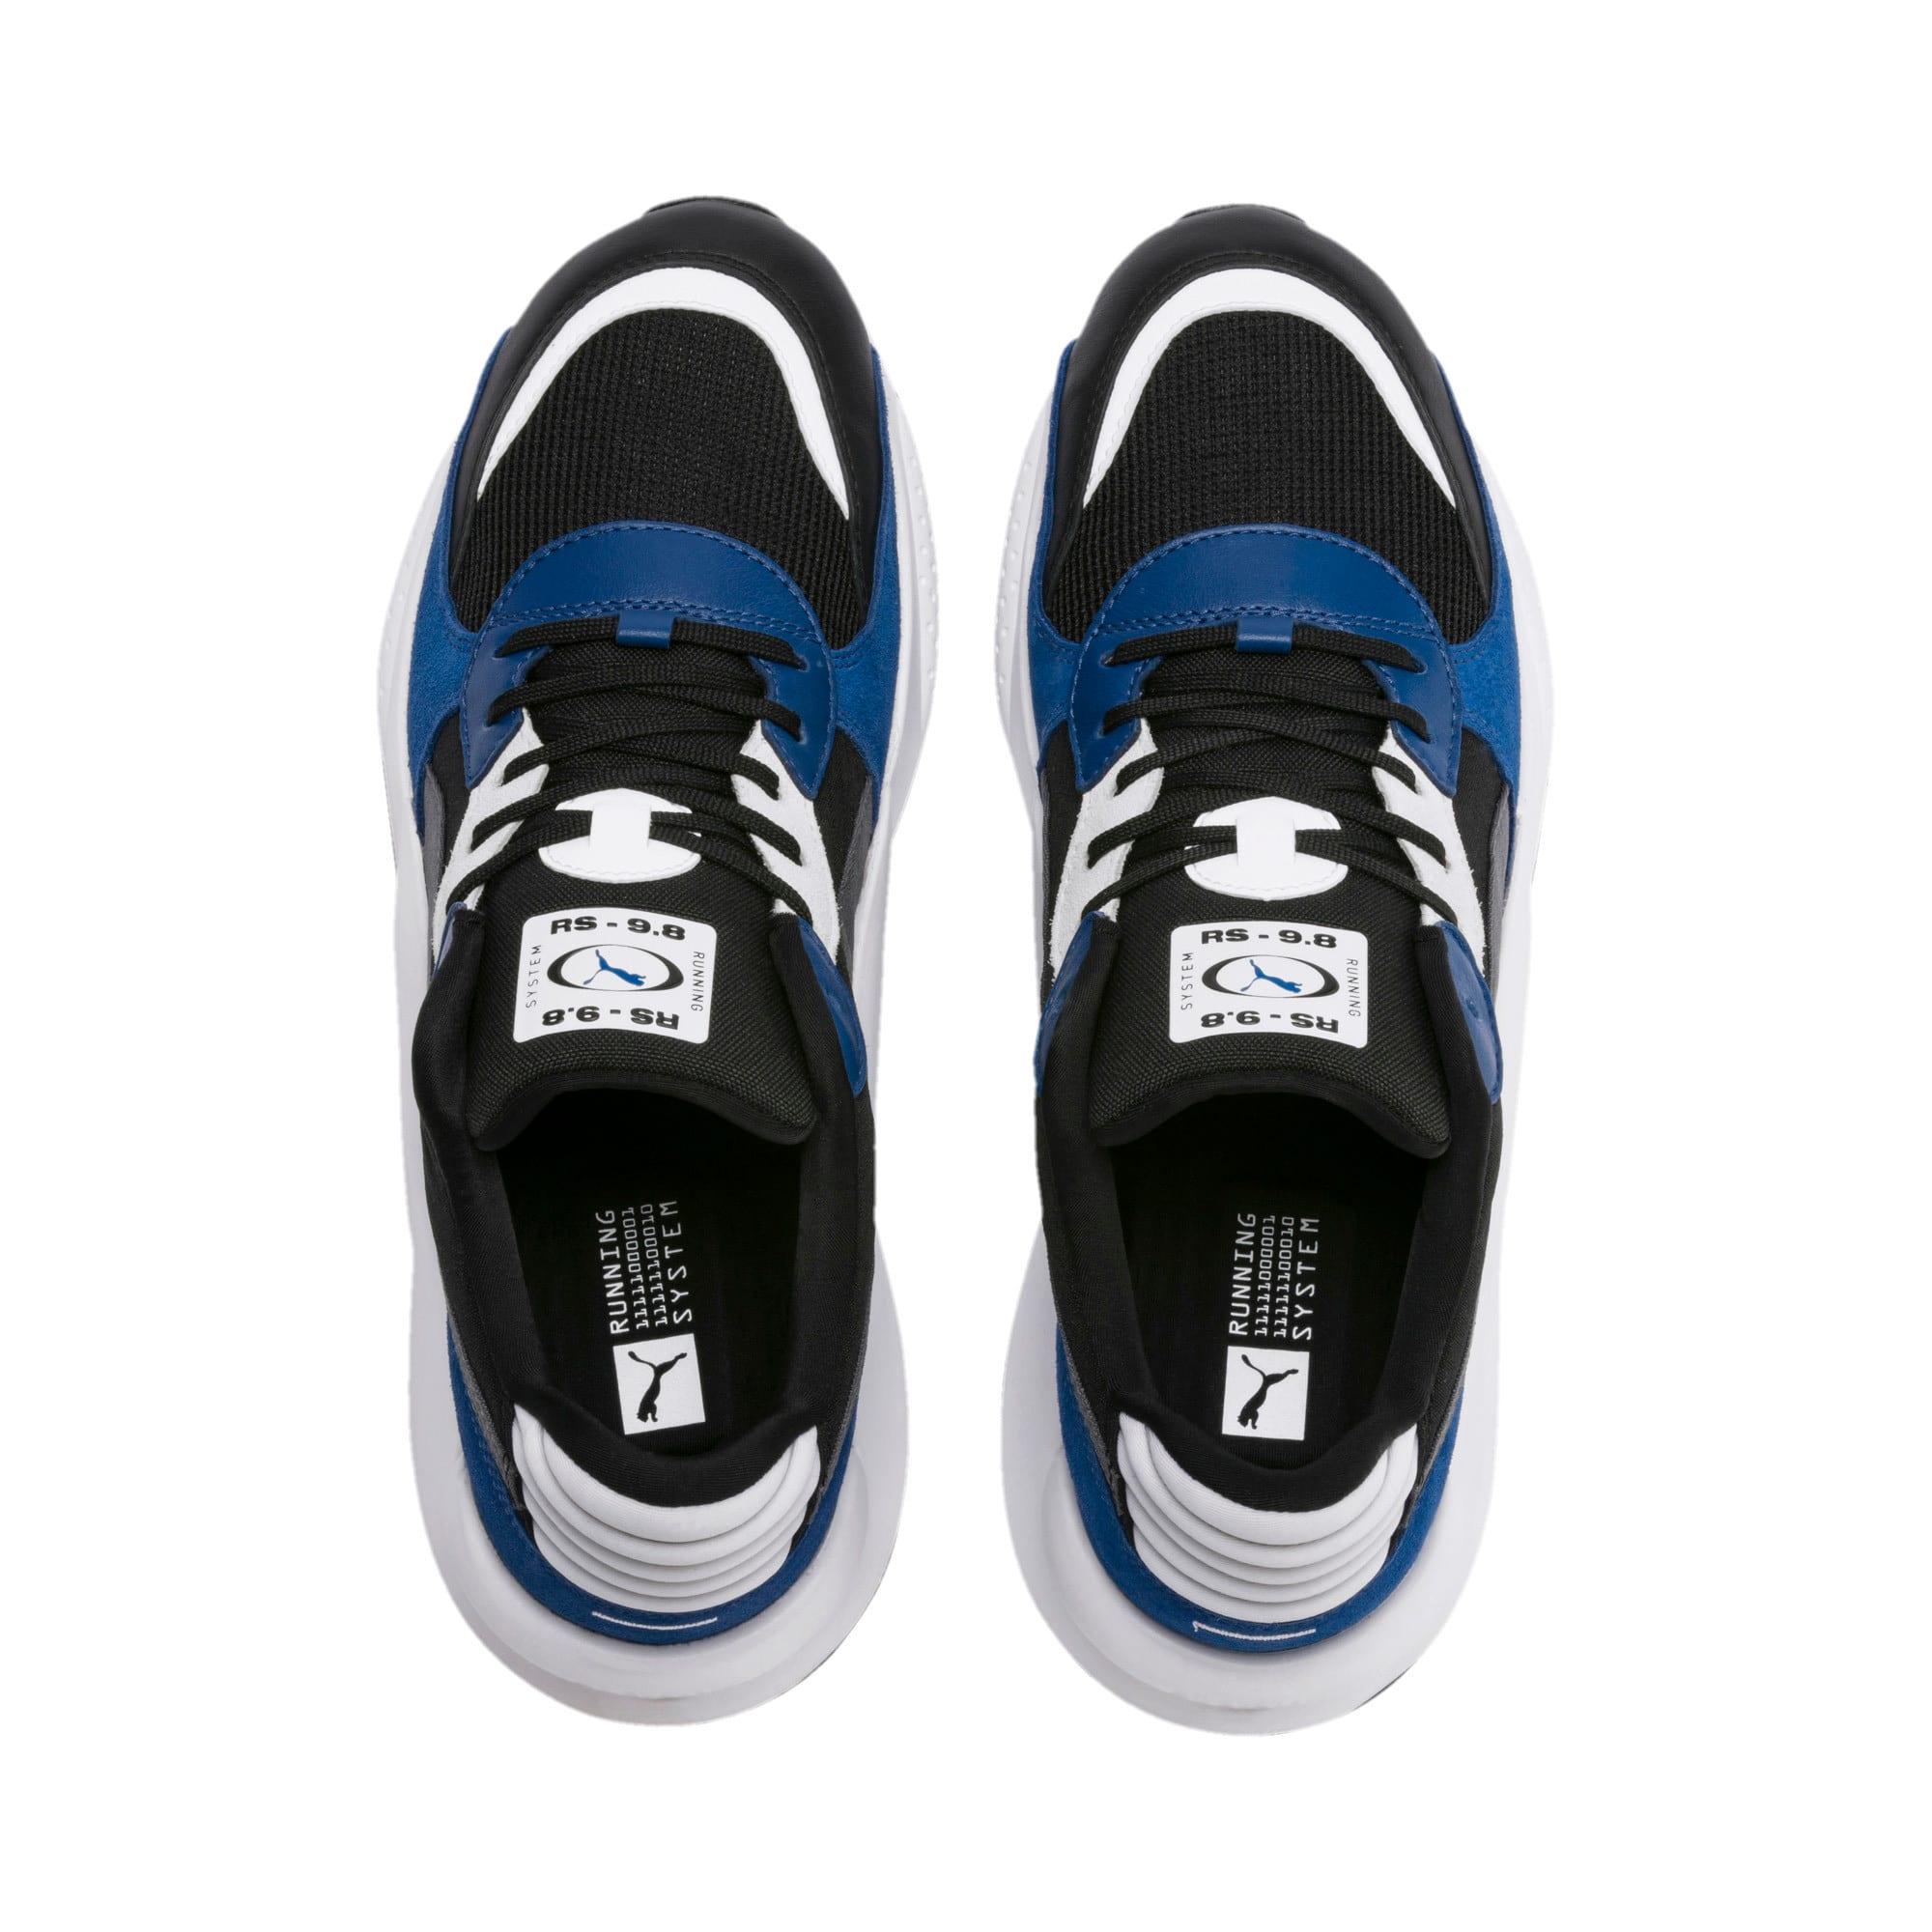 Thumbnail 6 of RS 9.8 Space Sneakers, Puma Black-Galaxy Blue, medium